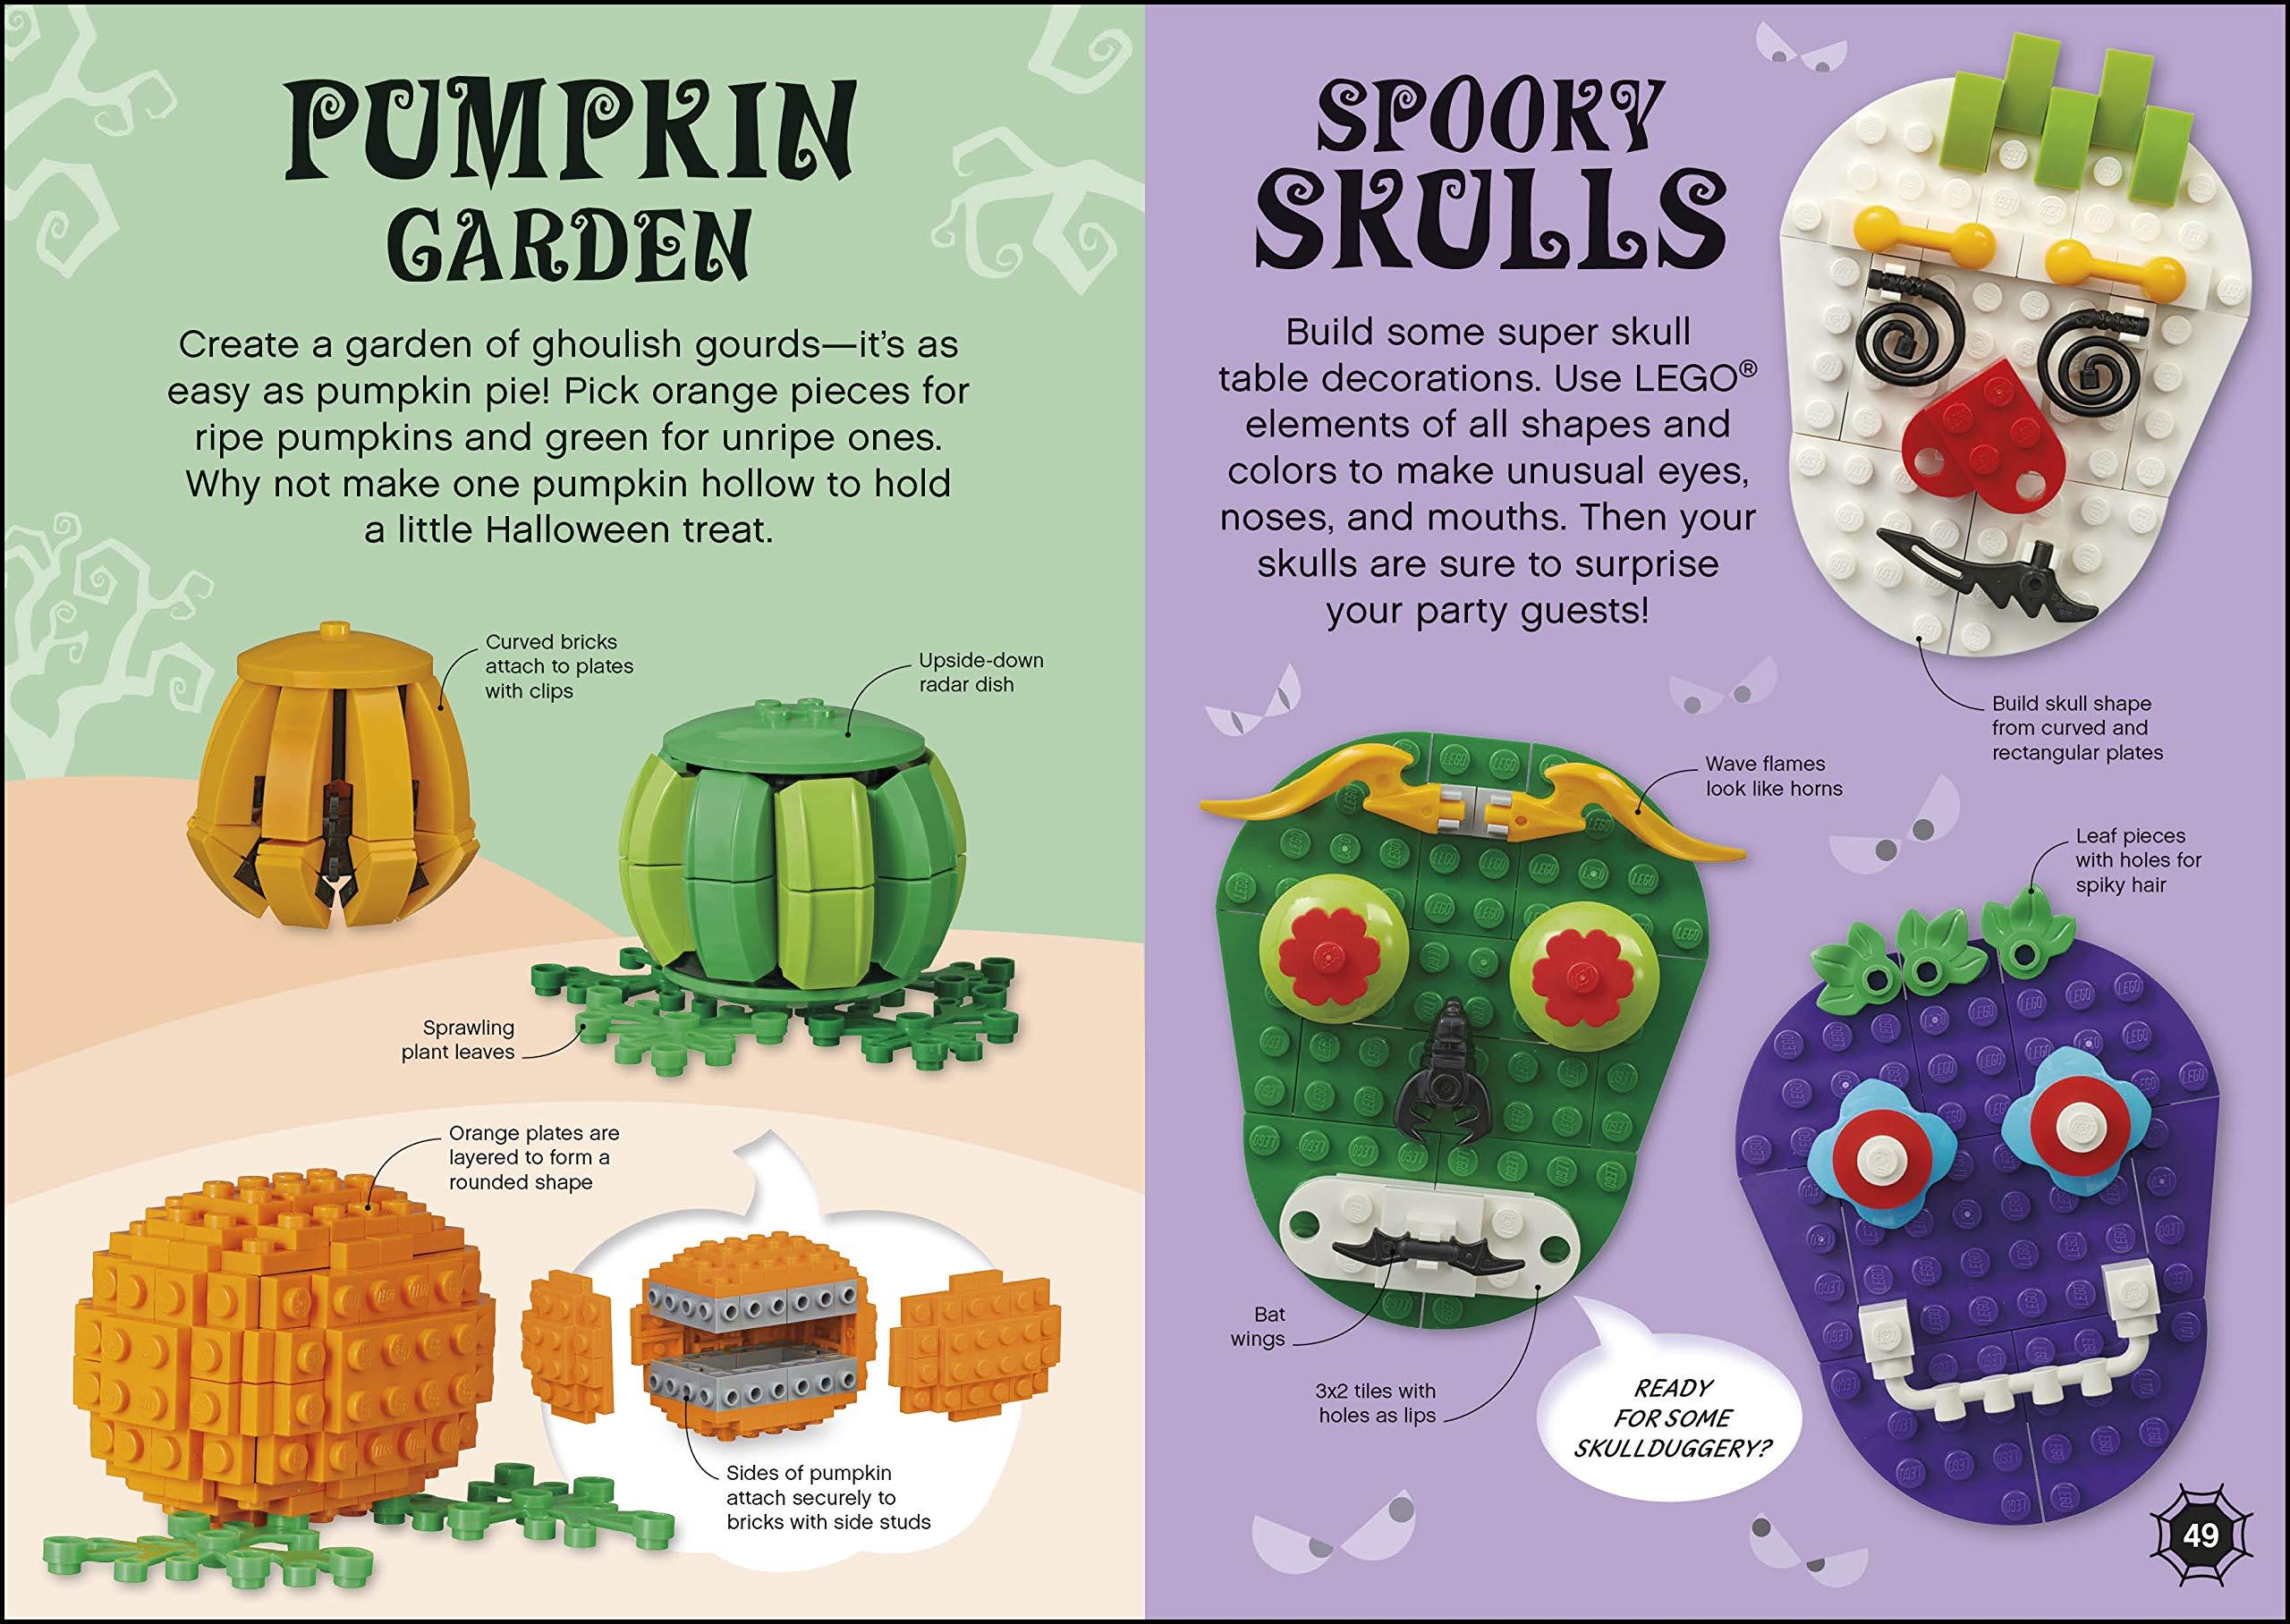 Lego Halloween Ideas: With Exclusive Spooky Scene Model With Toy: Amazon.es: Wood, Selina, March, Julia: Libros en idiomas extranjeros